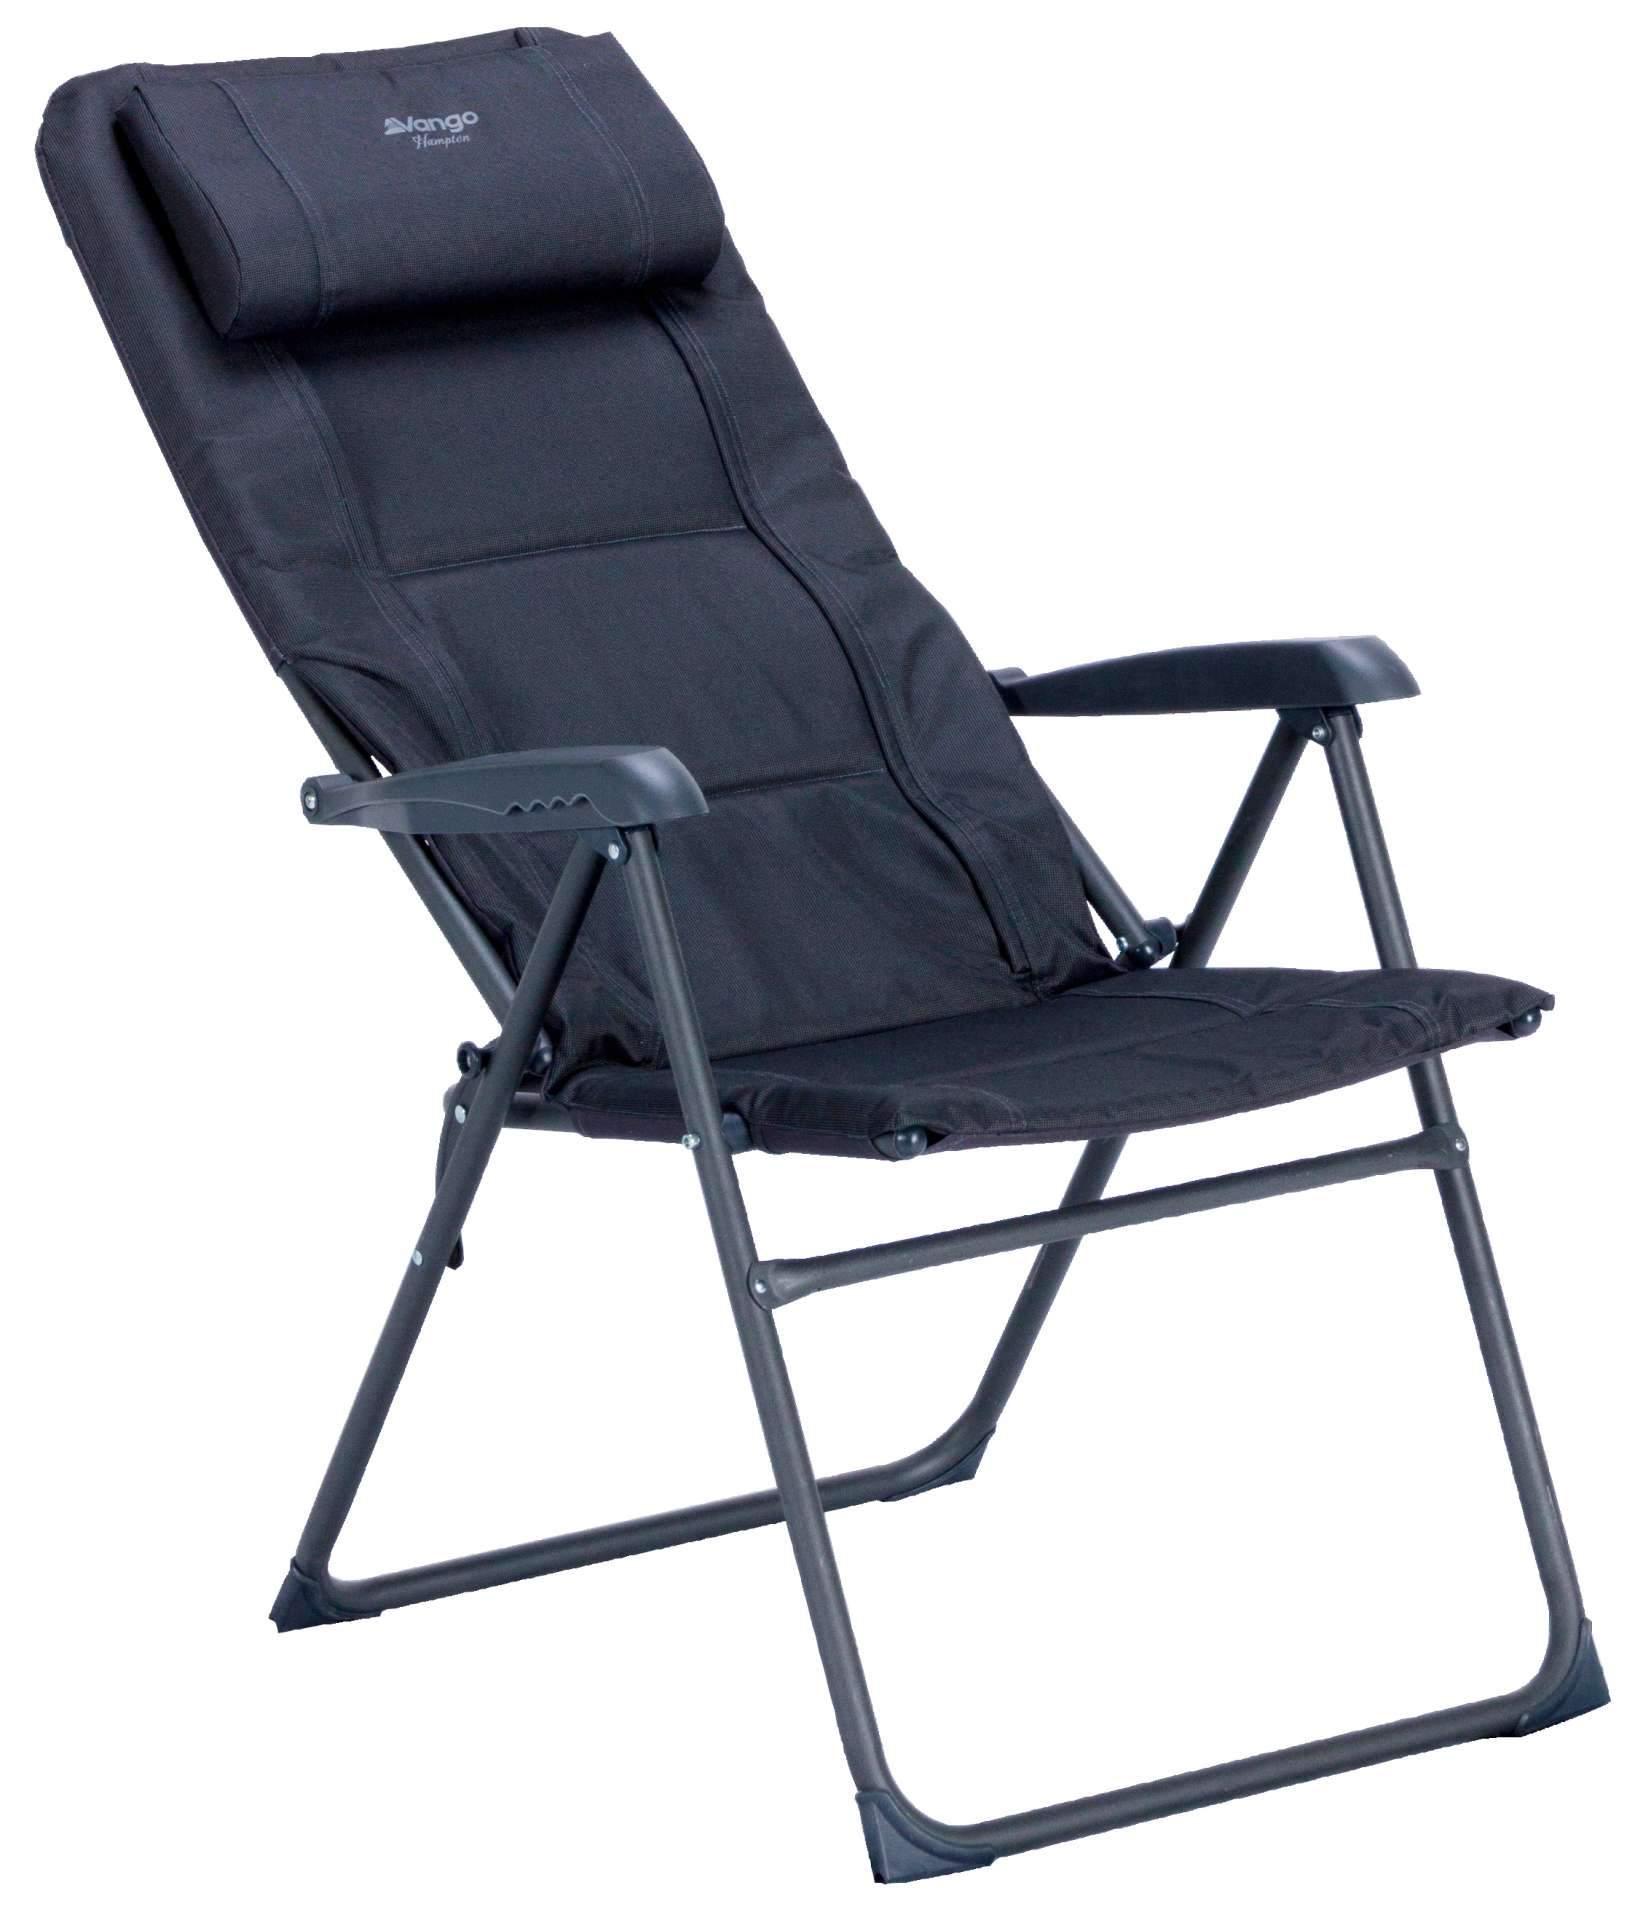 vango 2017 family essentials hampton dlx chair excalibur reclined 4 HI